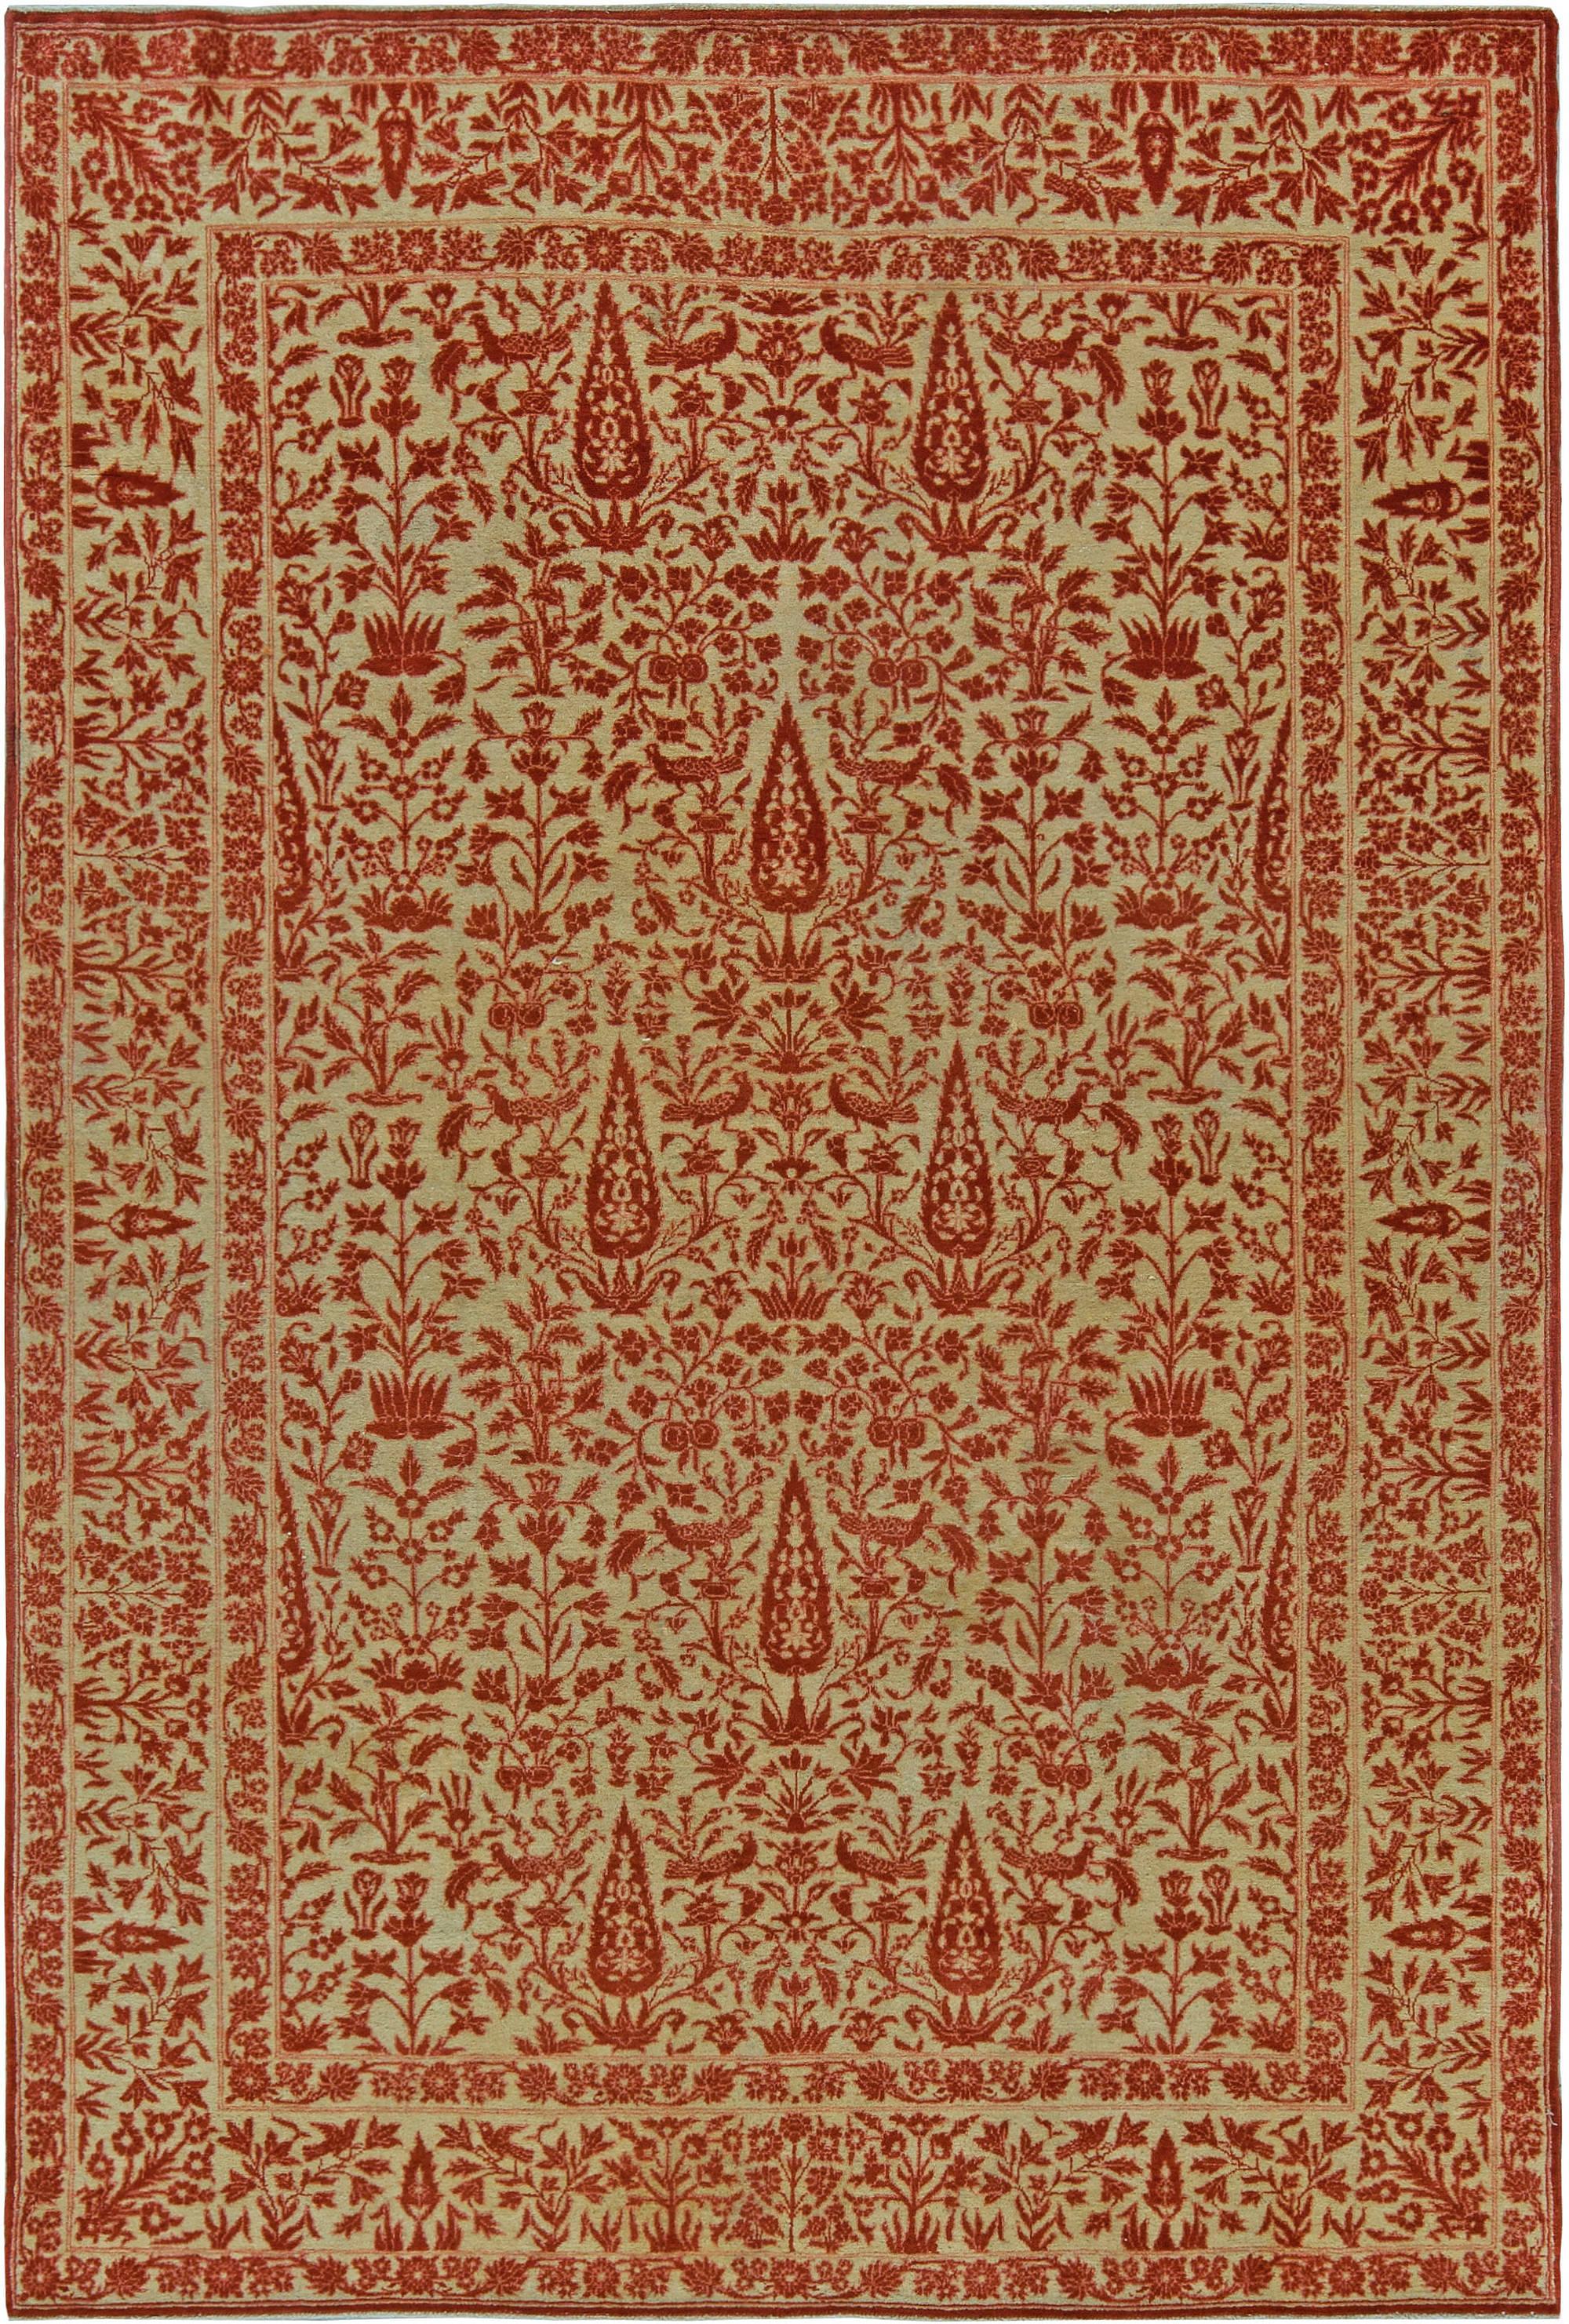 Antique Persian Tabriz Rug BB5612